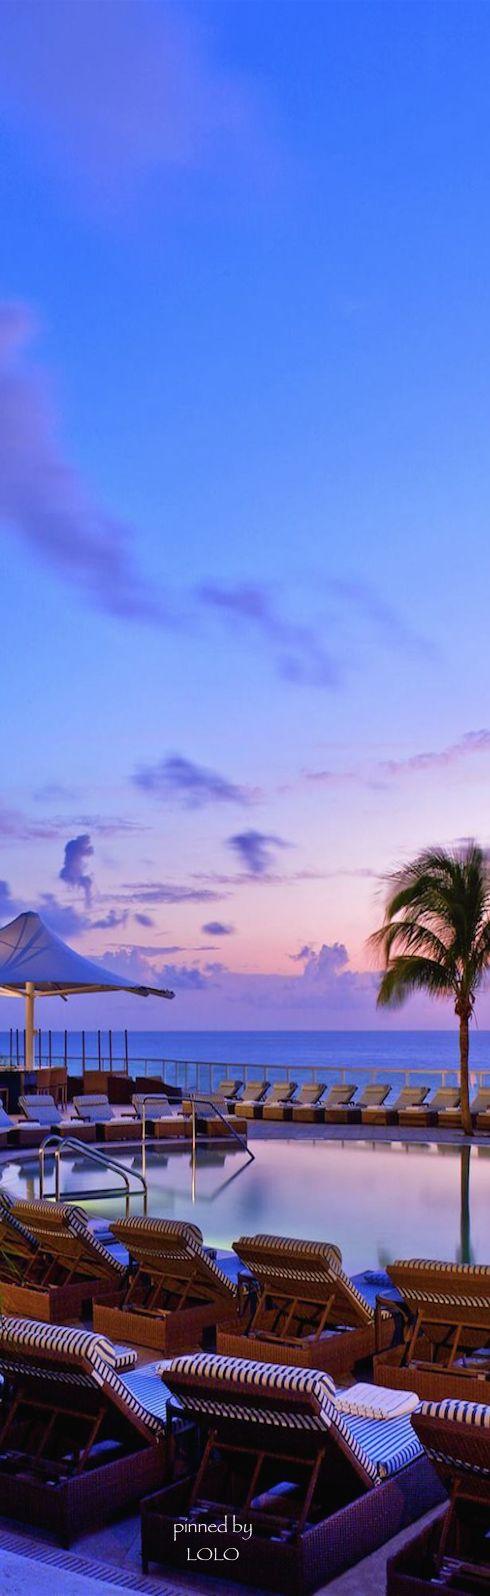 Ritz Carlton Fort Lauderdale, Florida   LOLO